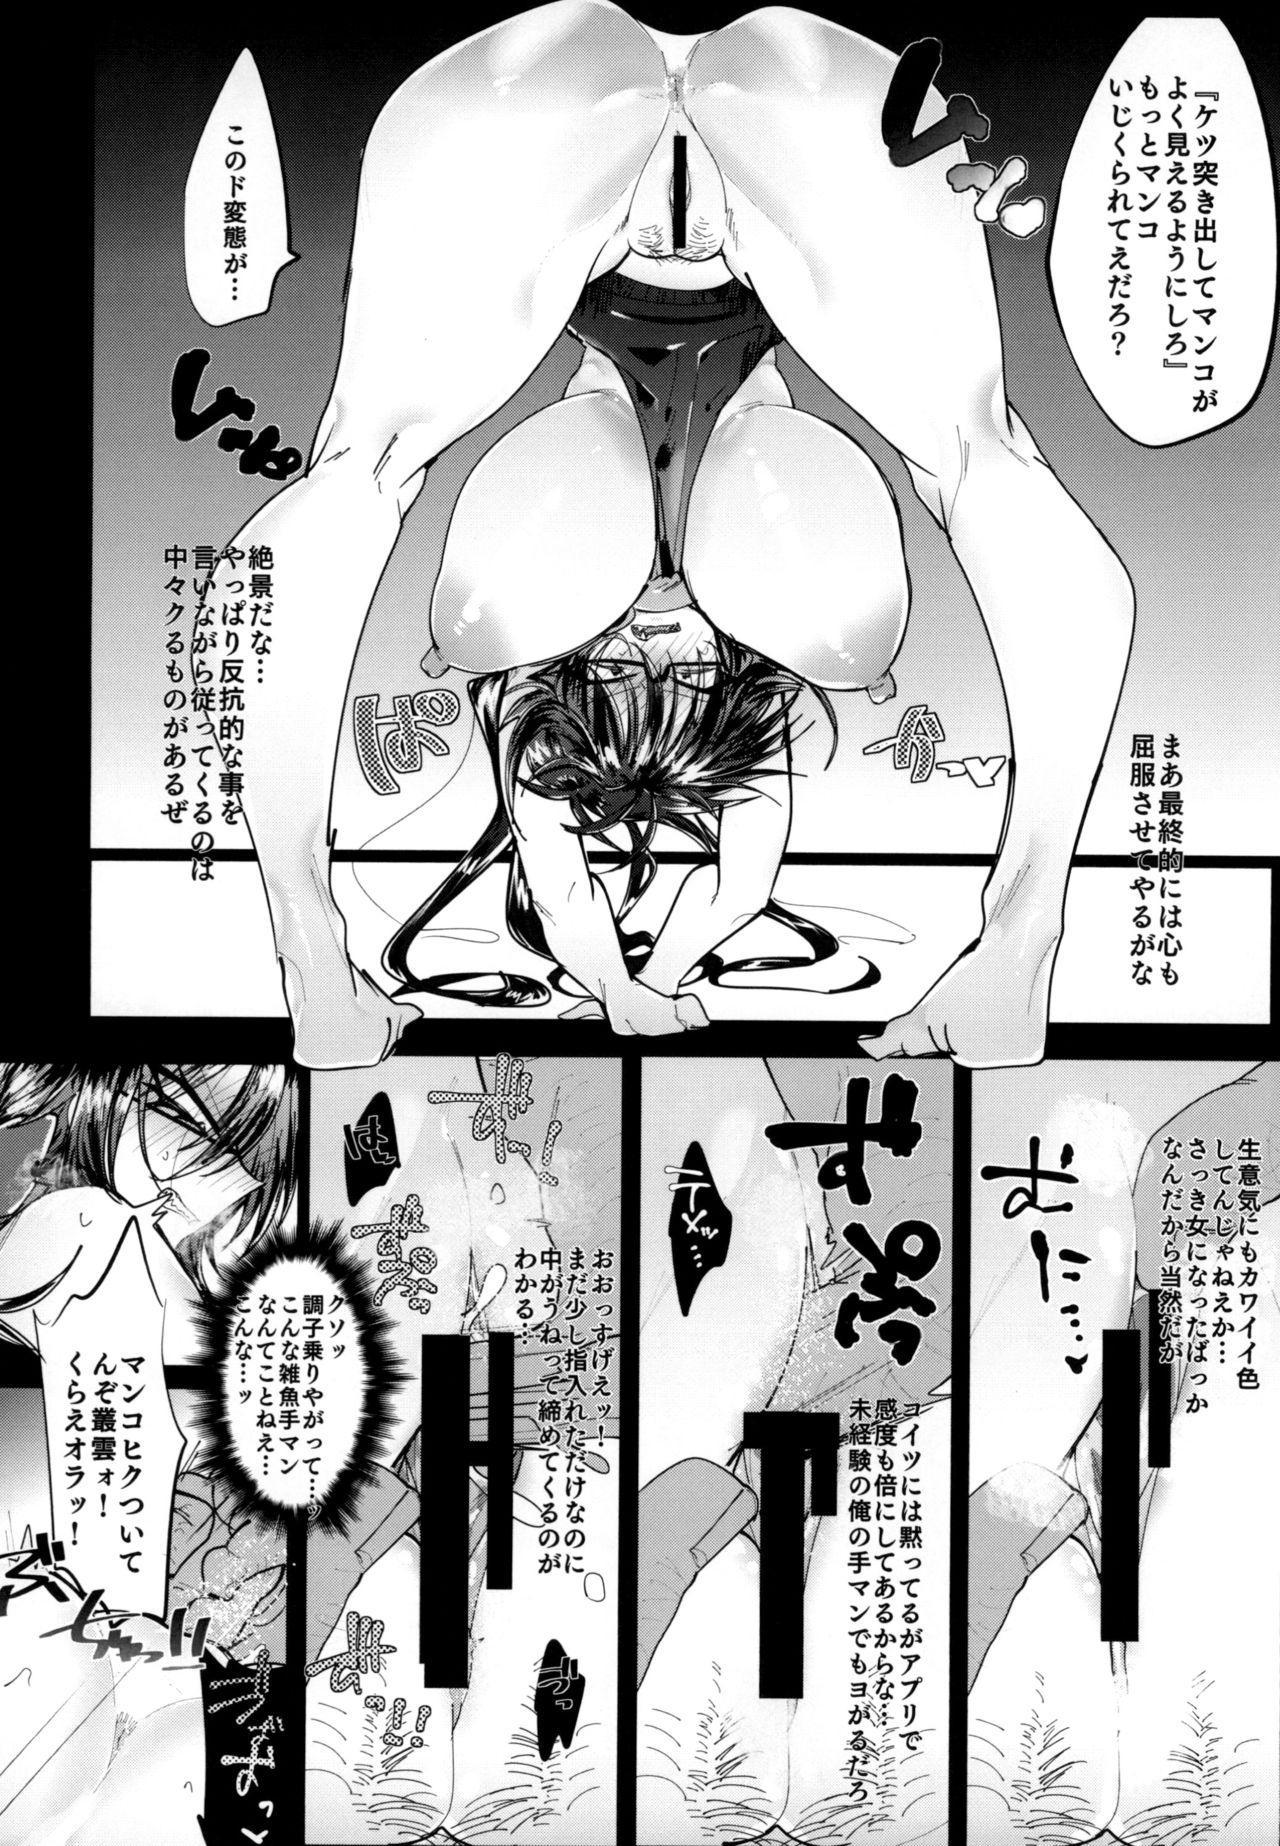 Kurokami Sanpakugan Megane Danshi TS Kyousei Fukujuu Fuck 13